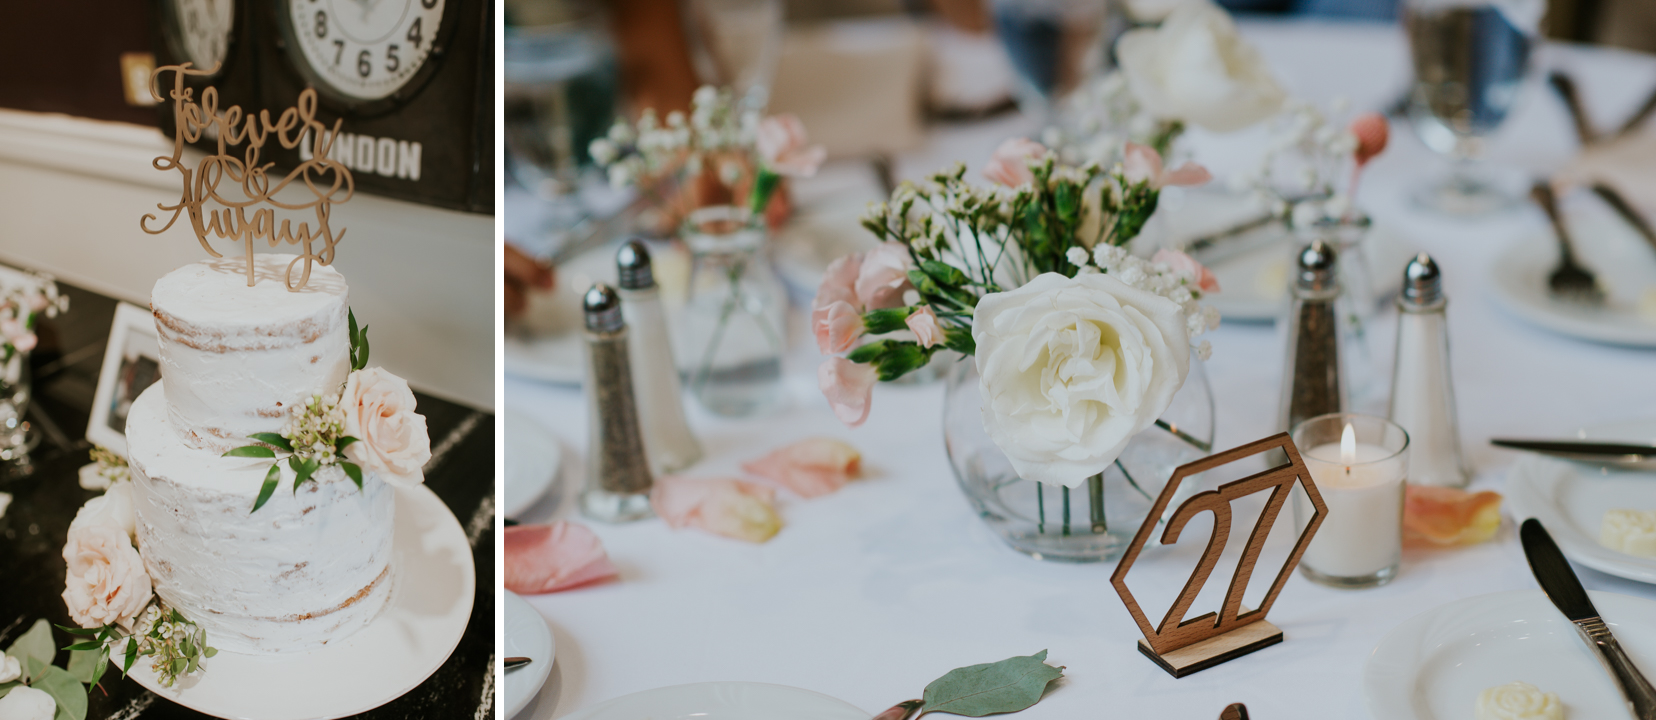 LGP-ann-arbor-eagle-crest-wedding-051.jpg